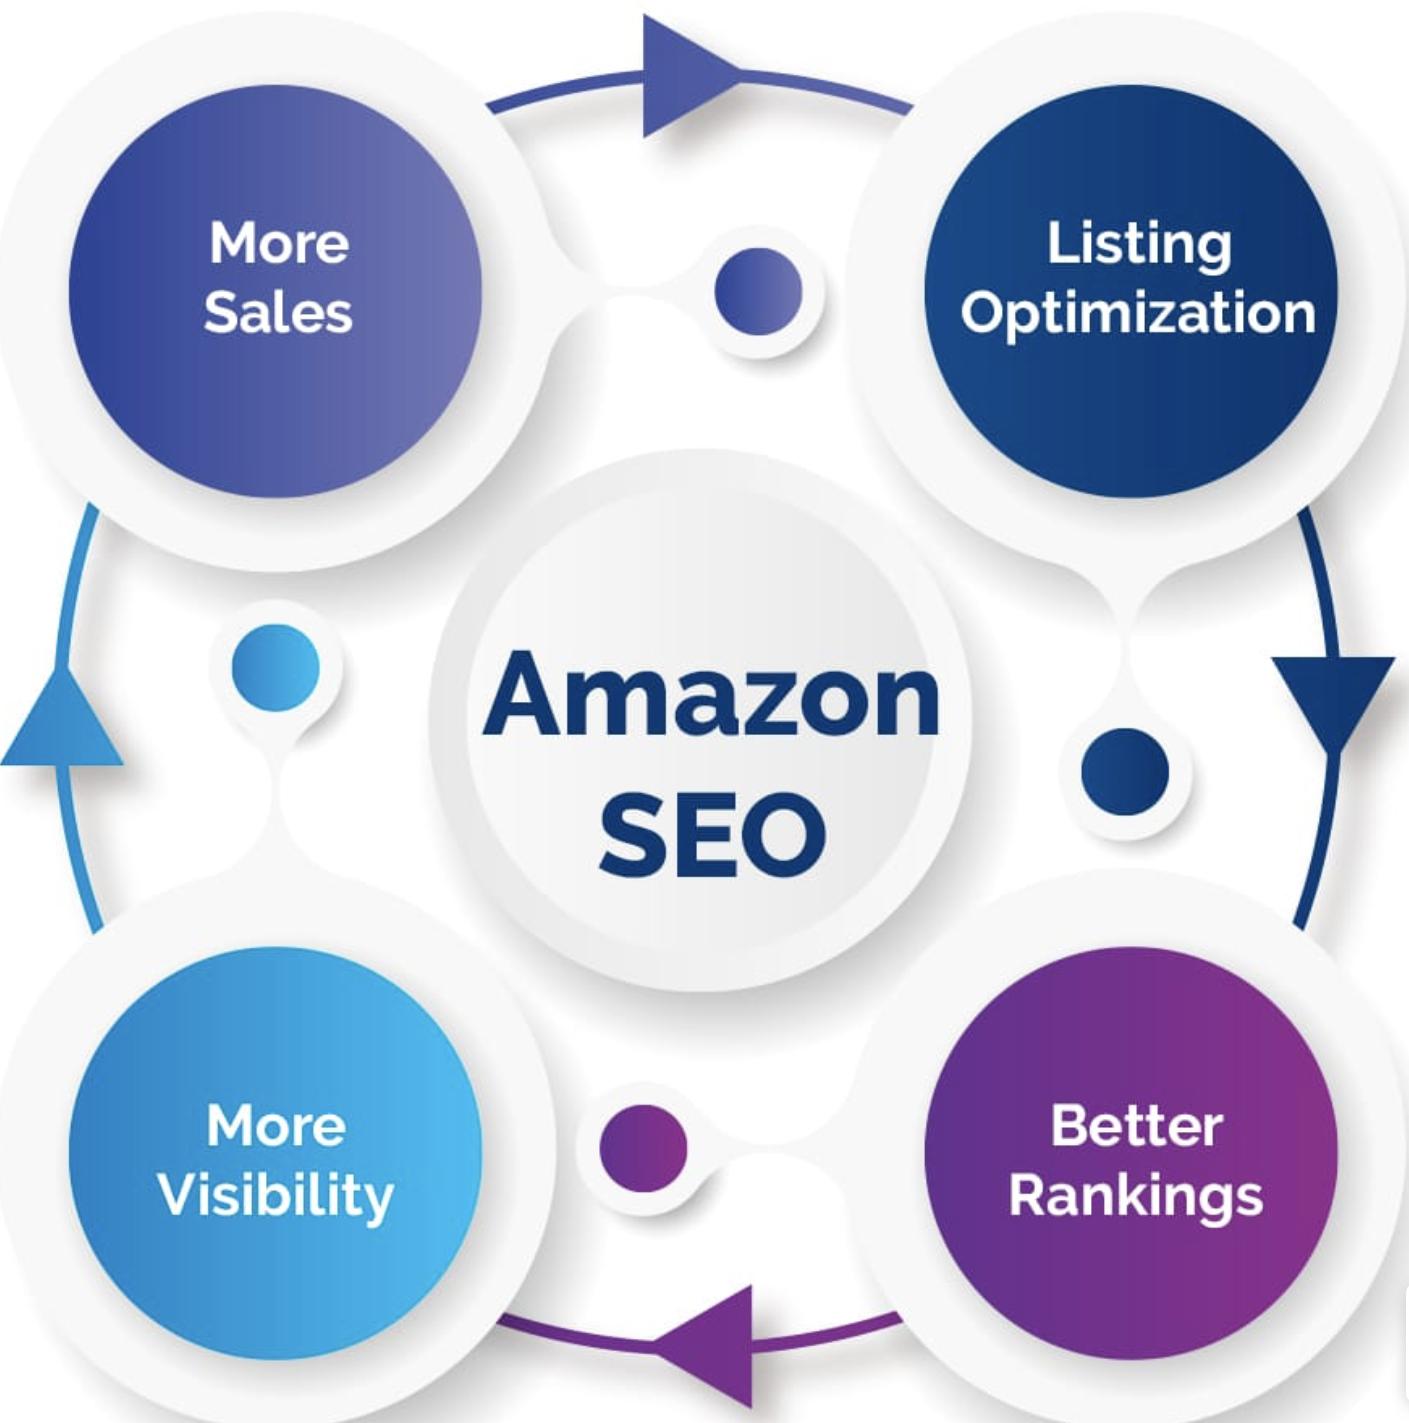 Amazon SEO process